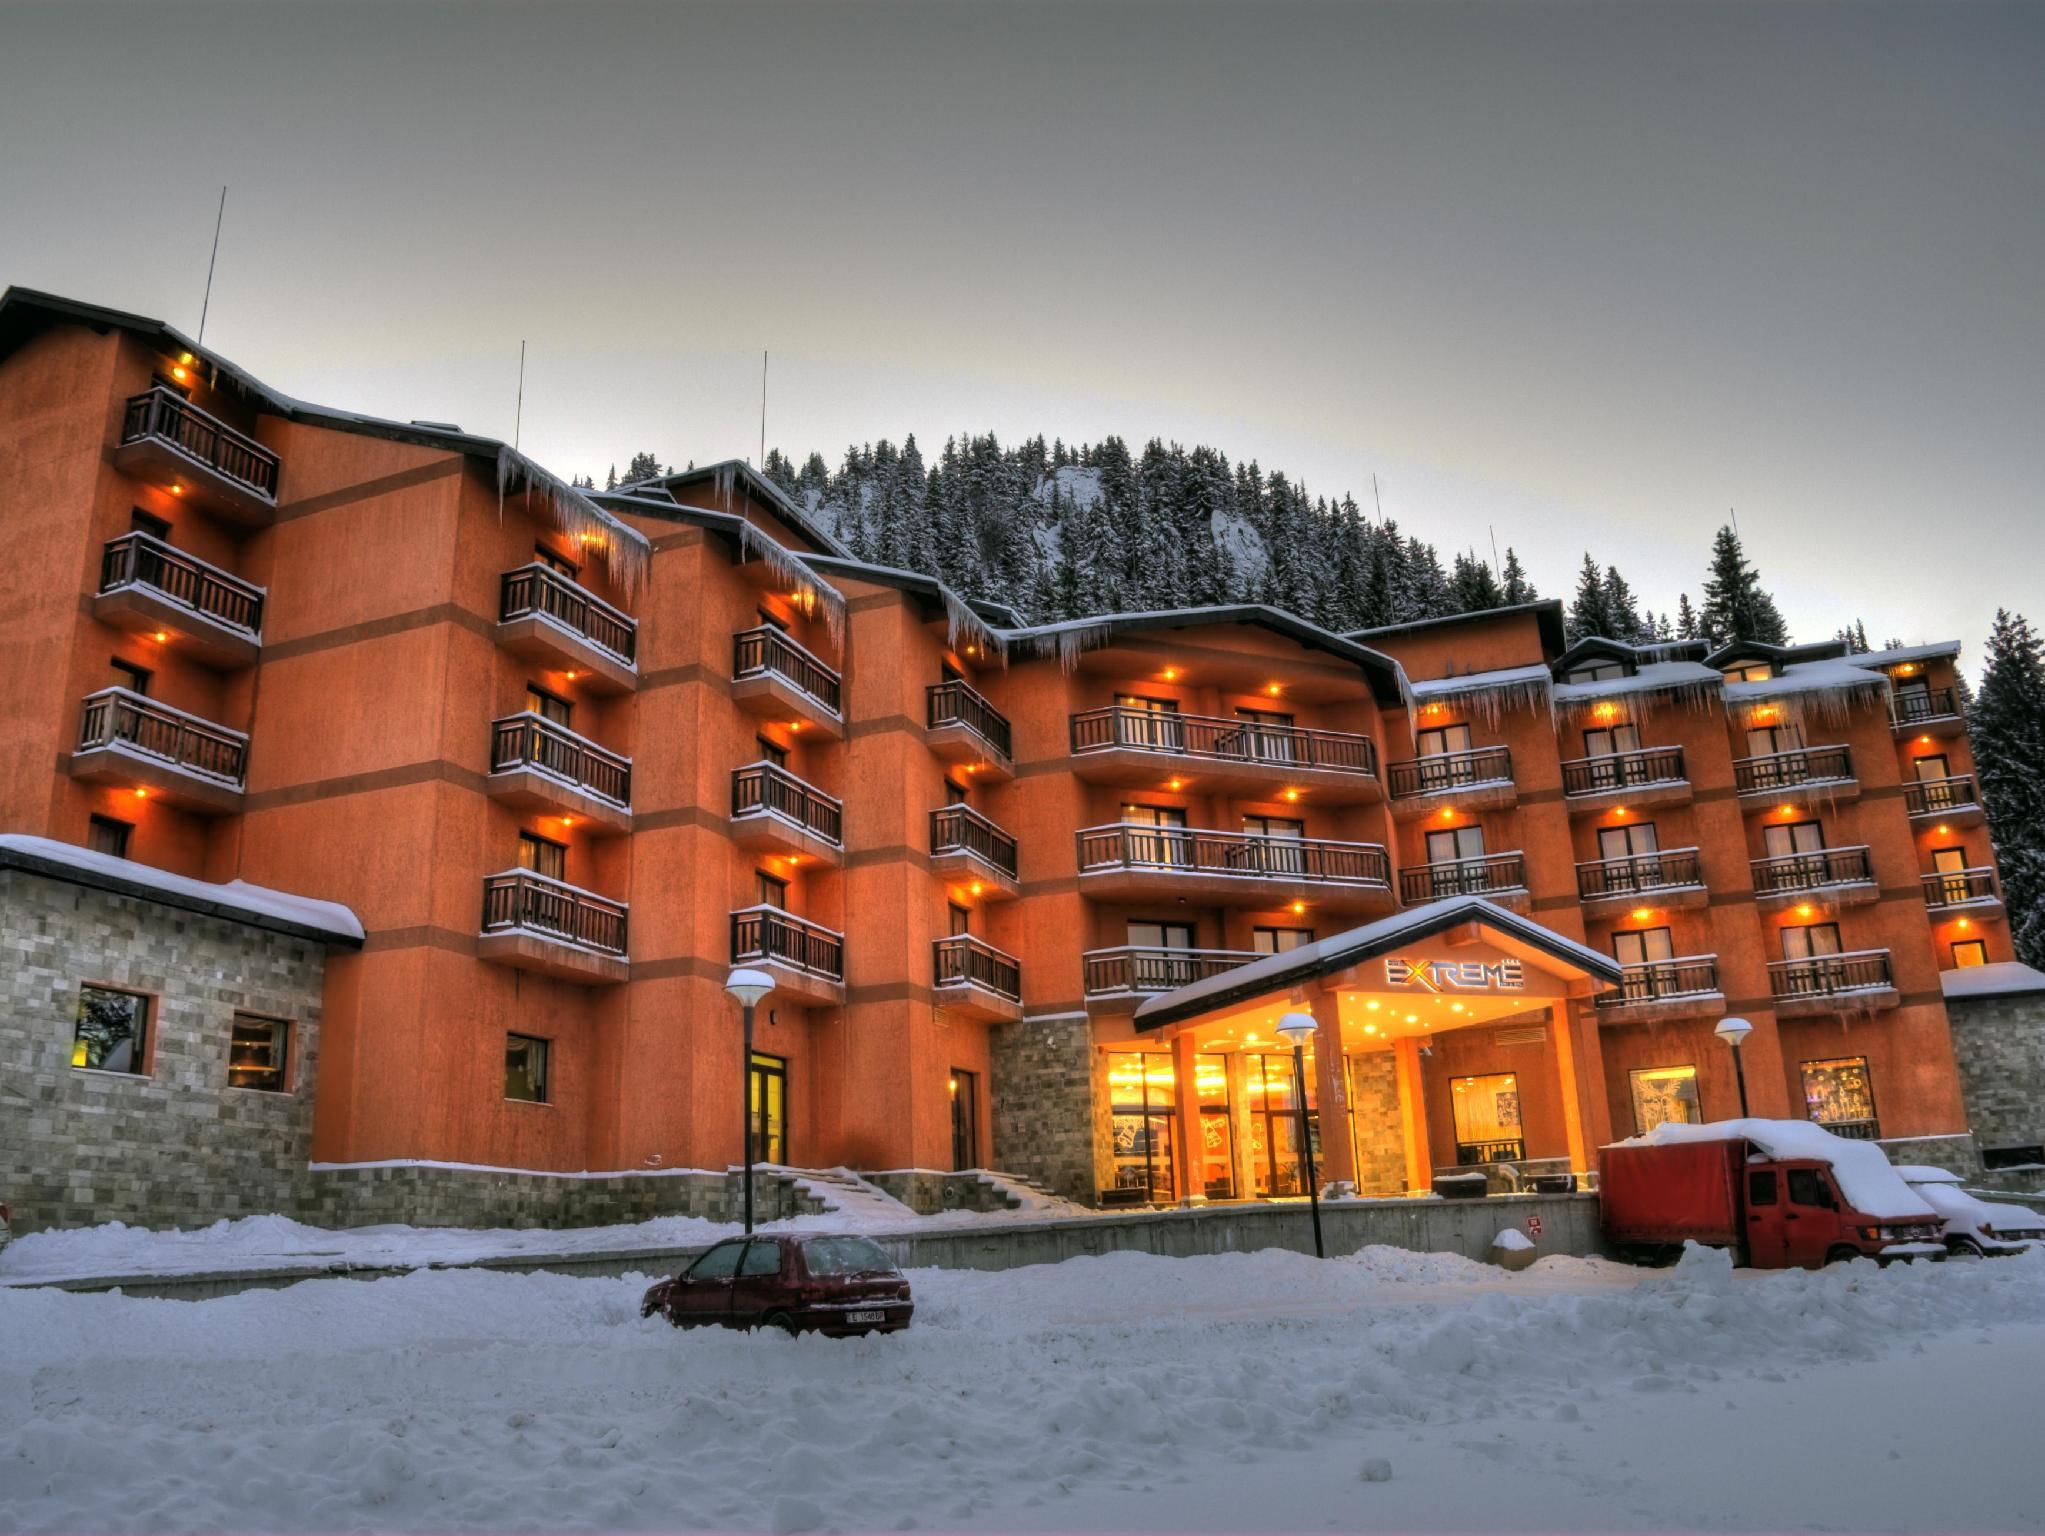 Hotel Extreme, Smolyan